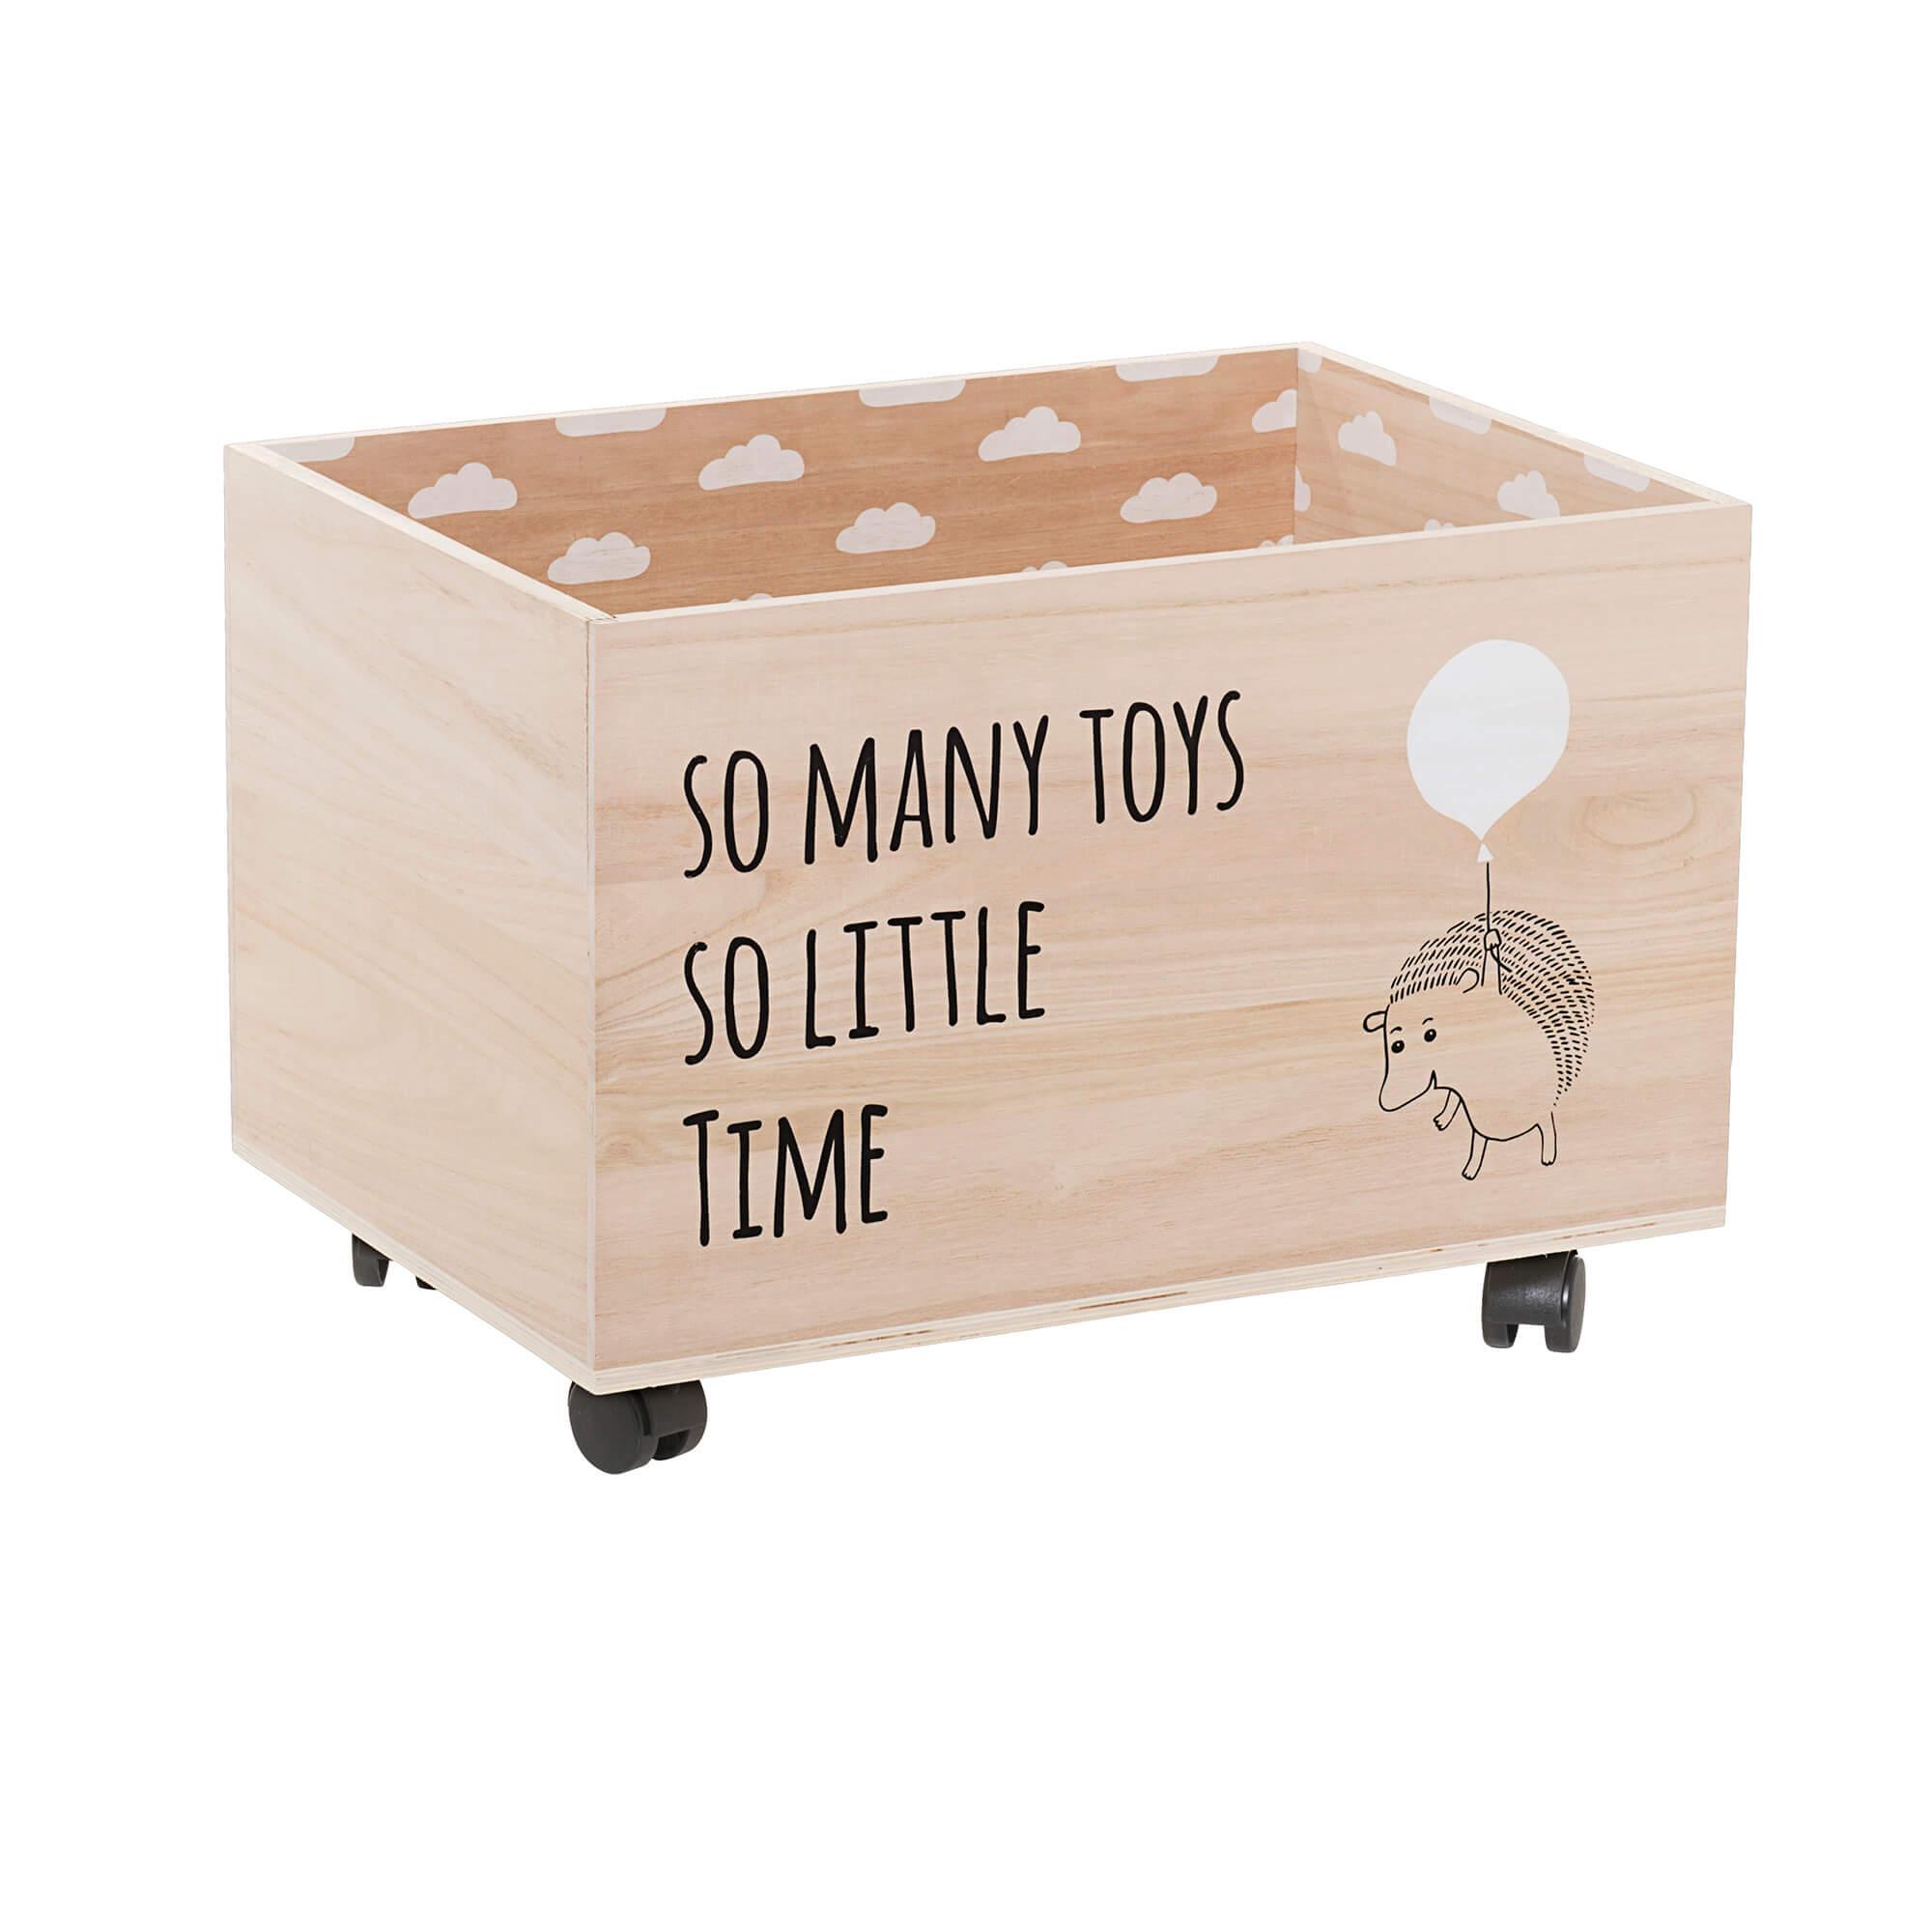 Bloomingville Mini Opbevaringskasse Natur Paulowniatrae M Hjul Opbevaringskasser Til Born Bobo Mobler Boligtilbehor Og Indretning Til Hjemmet